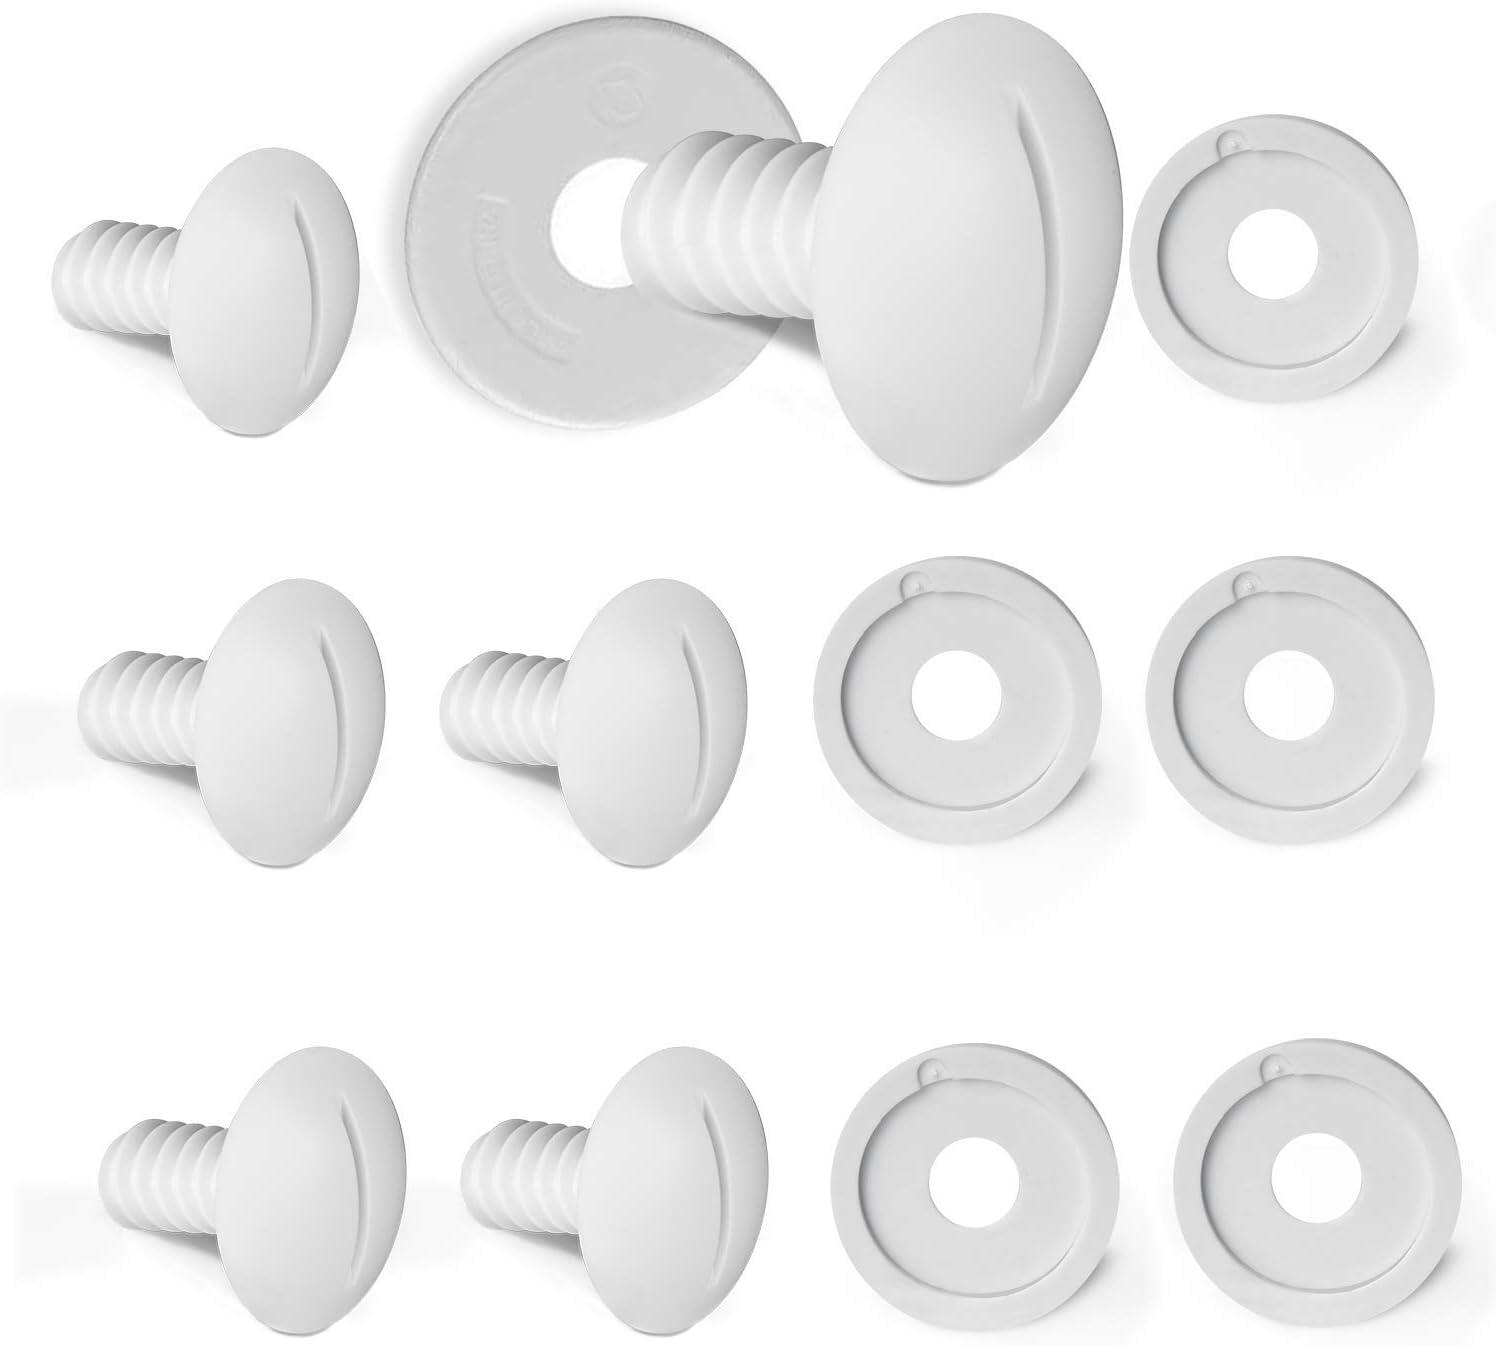 iBayx White Wheel Screws Set Including 6 PCS Plastic Wheel Screws Replacement for Polaris Pool Cleaner 180/280 and 6 PCS Washers Pool Cleaner Replacement Parts C55 C-55, White,12 Pack